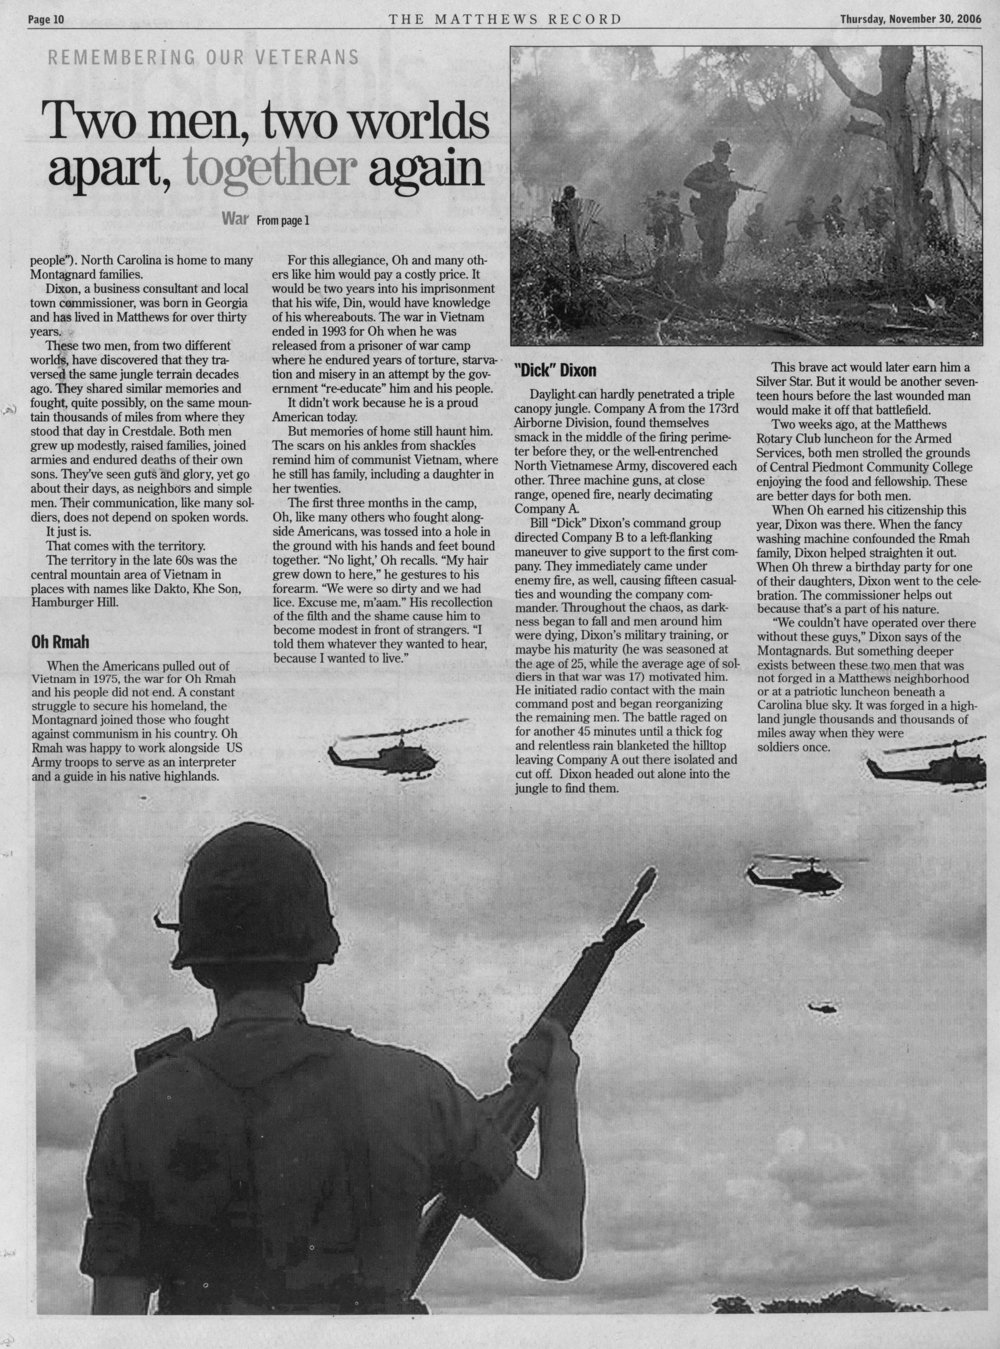 tbt november 30 2006.jpg